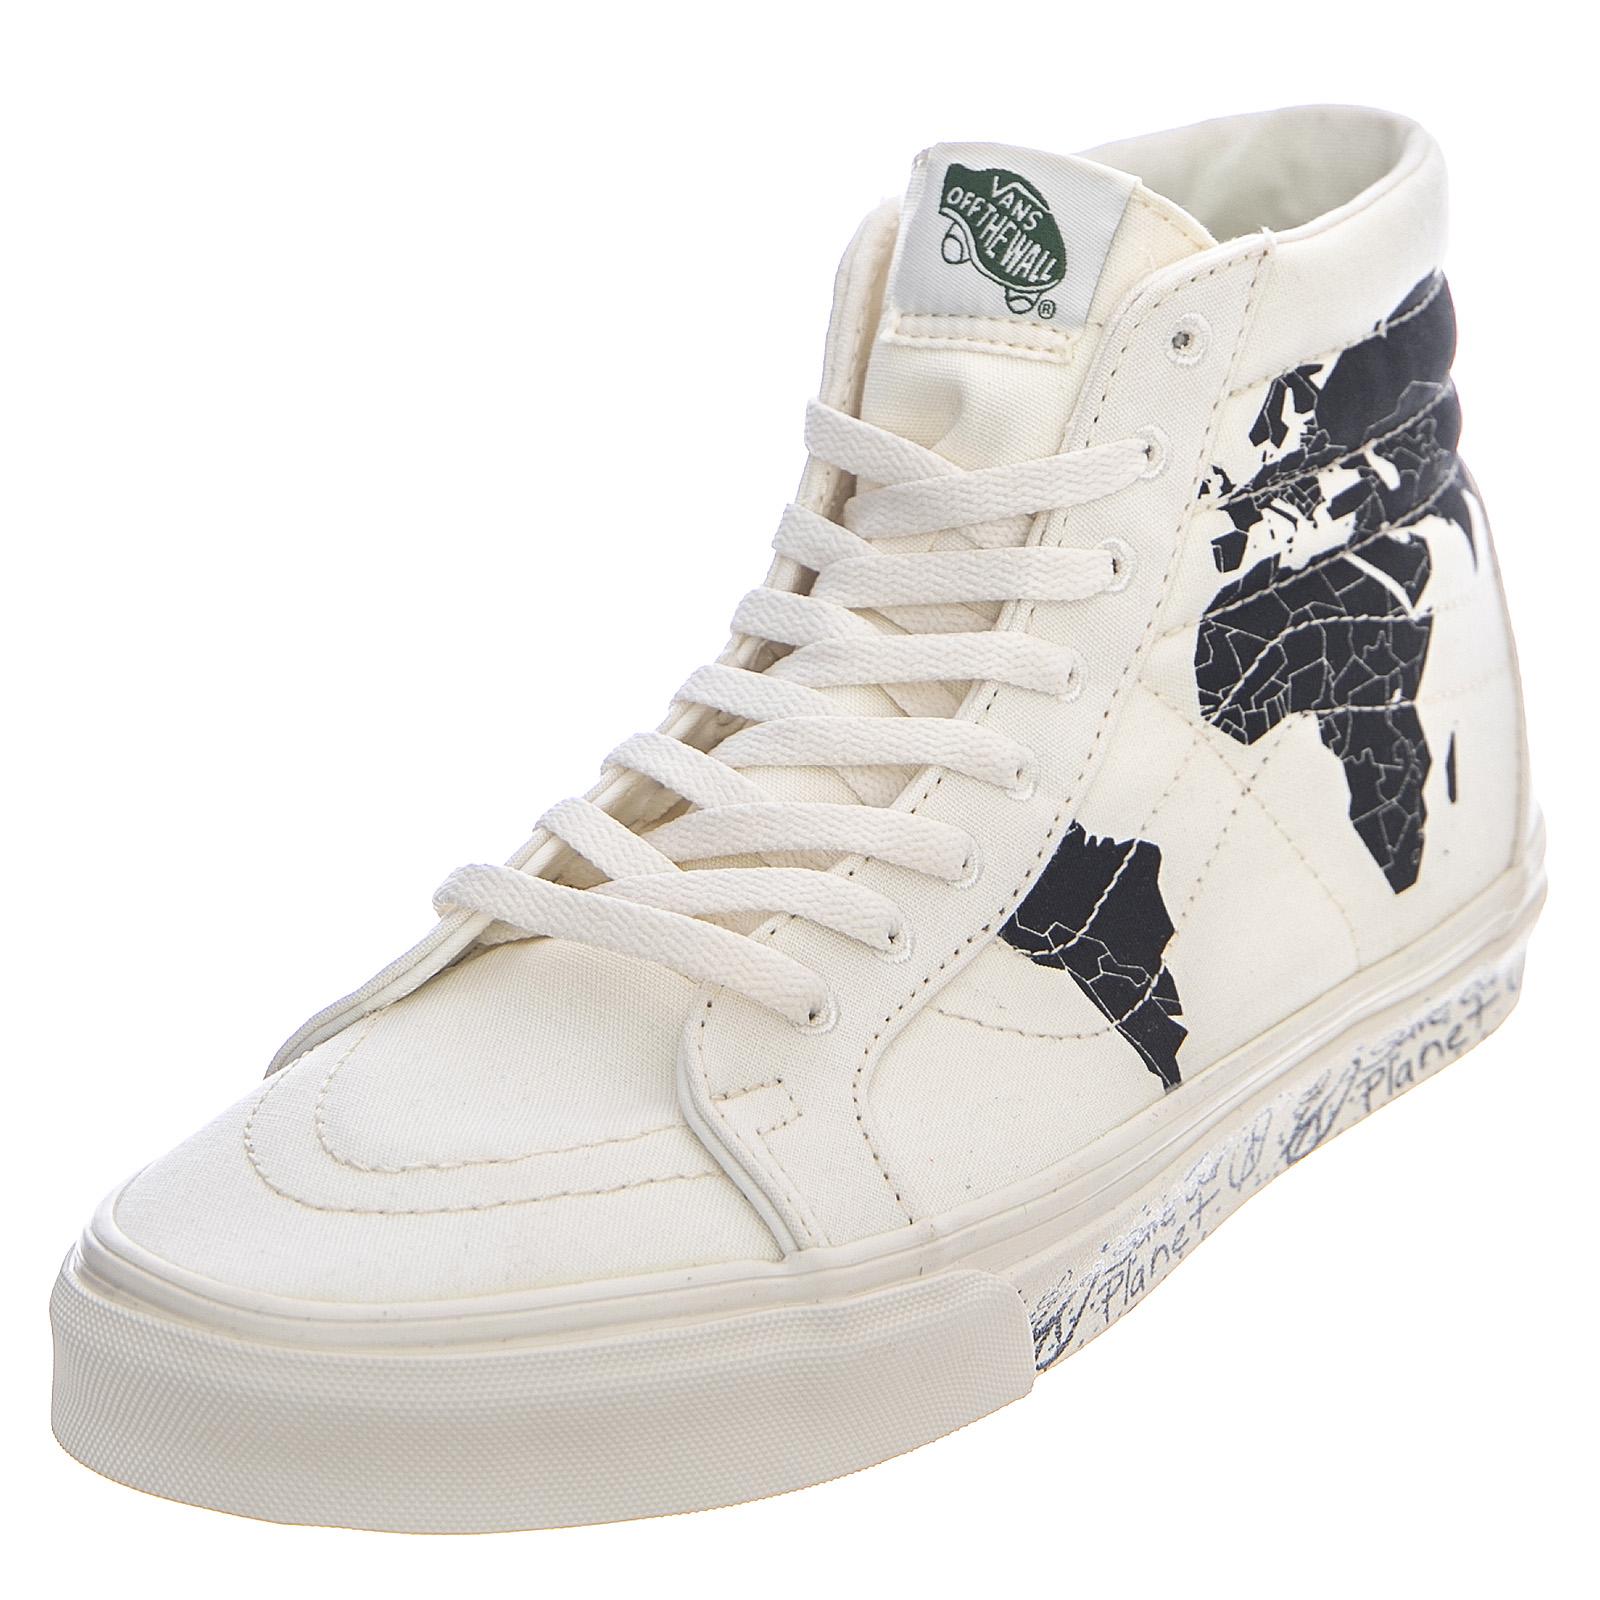 Dettagli su Vans ua sk8 hi reissue save our planet classic white black sneakers alte